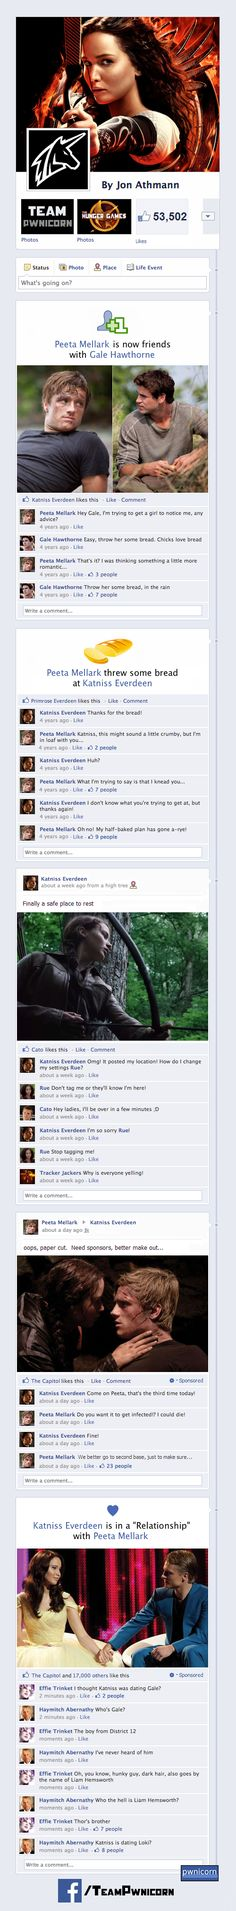 katniss is dating loki? Hahahaha